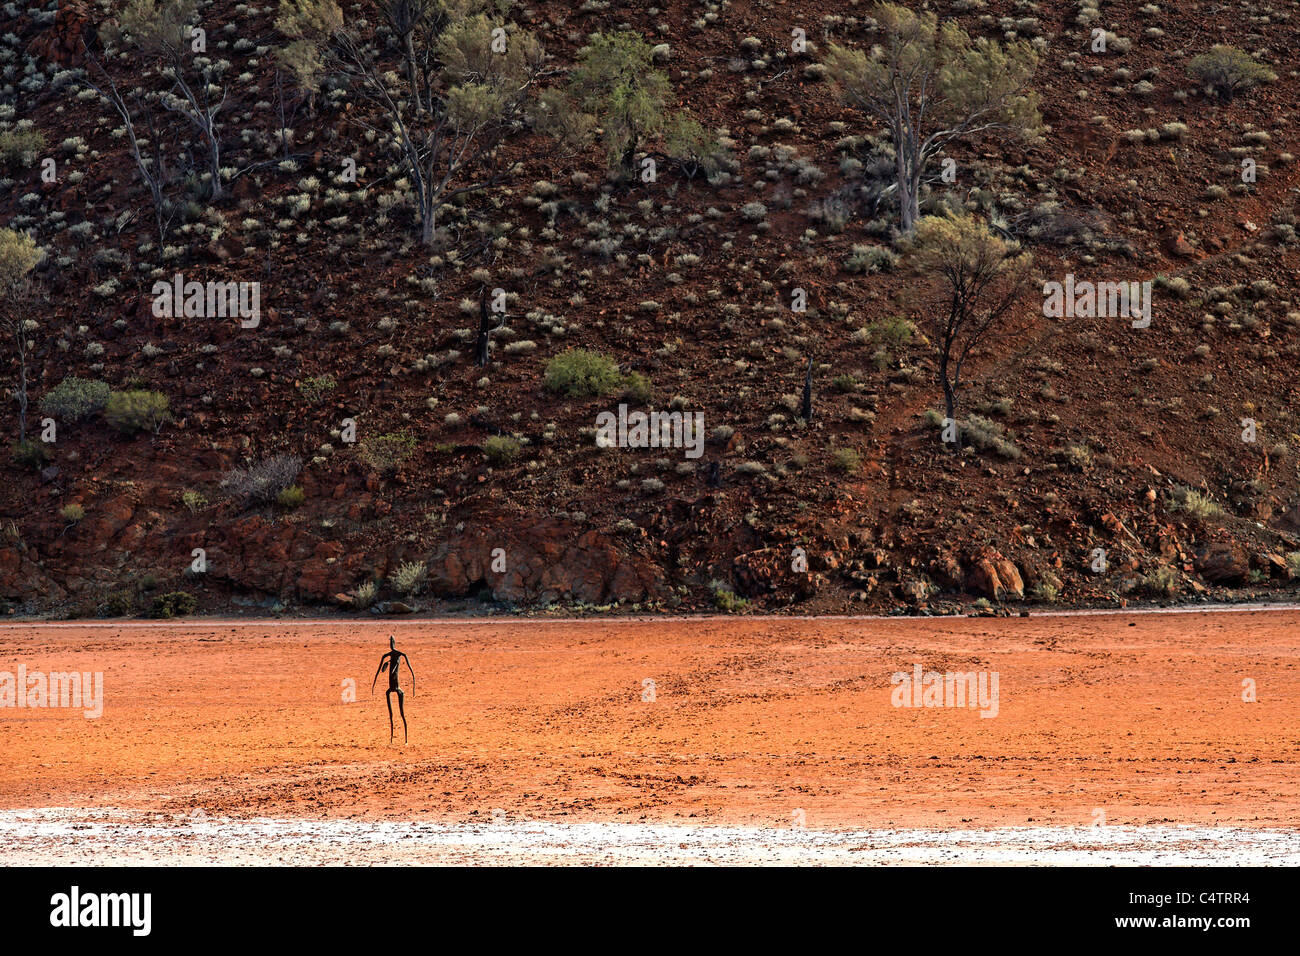 Art Sculptures ( Inside Australia Exhibition ) on Lake Ballard by Antony Gormley, Western Australia - Stock Image